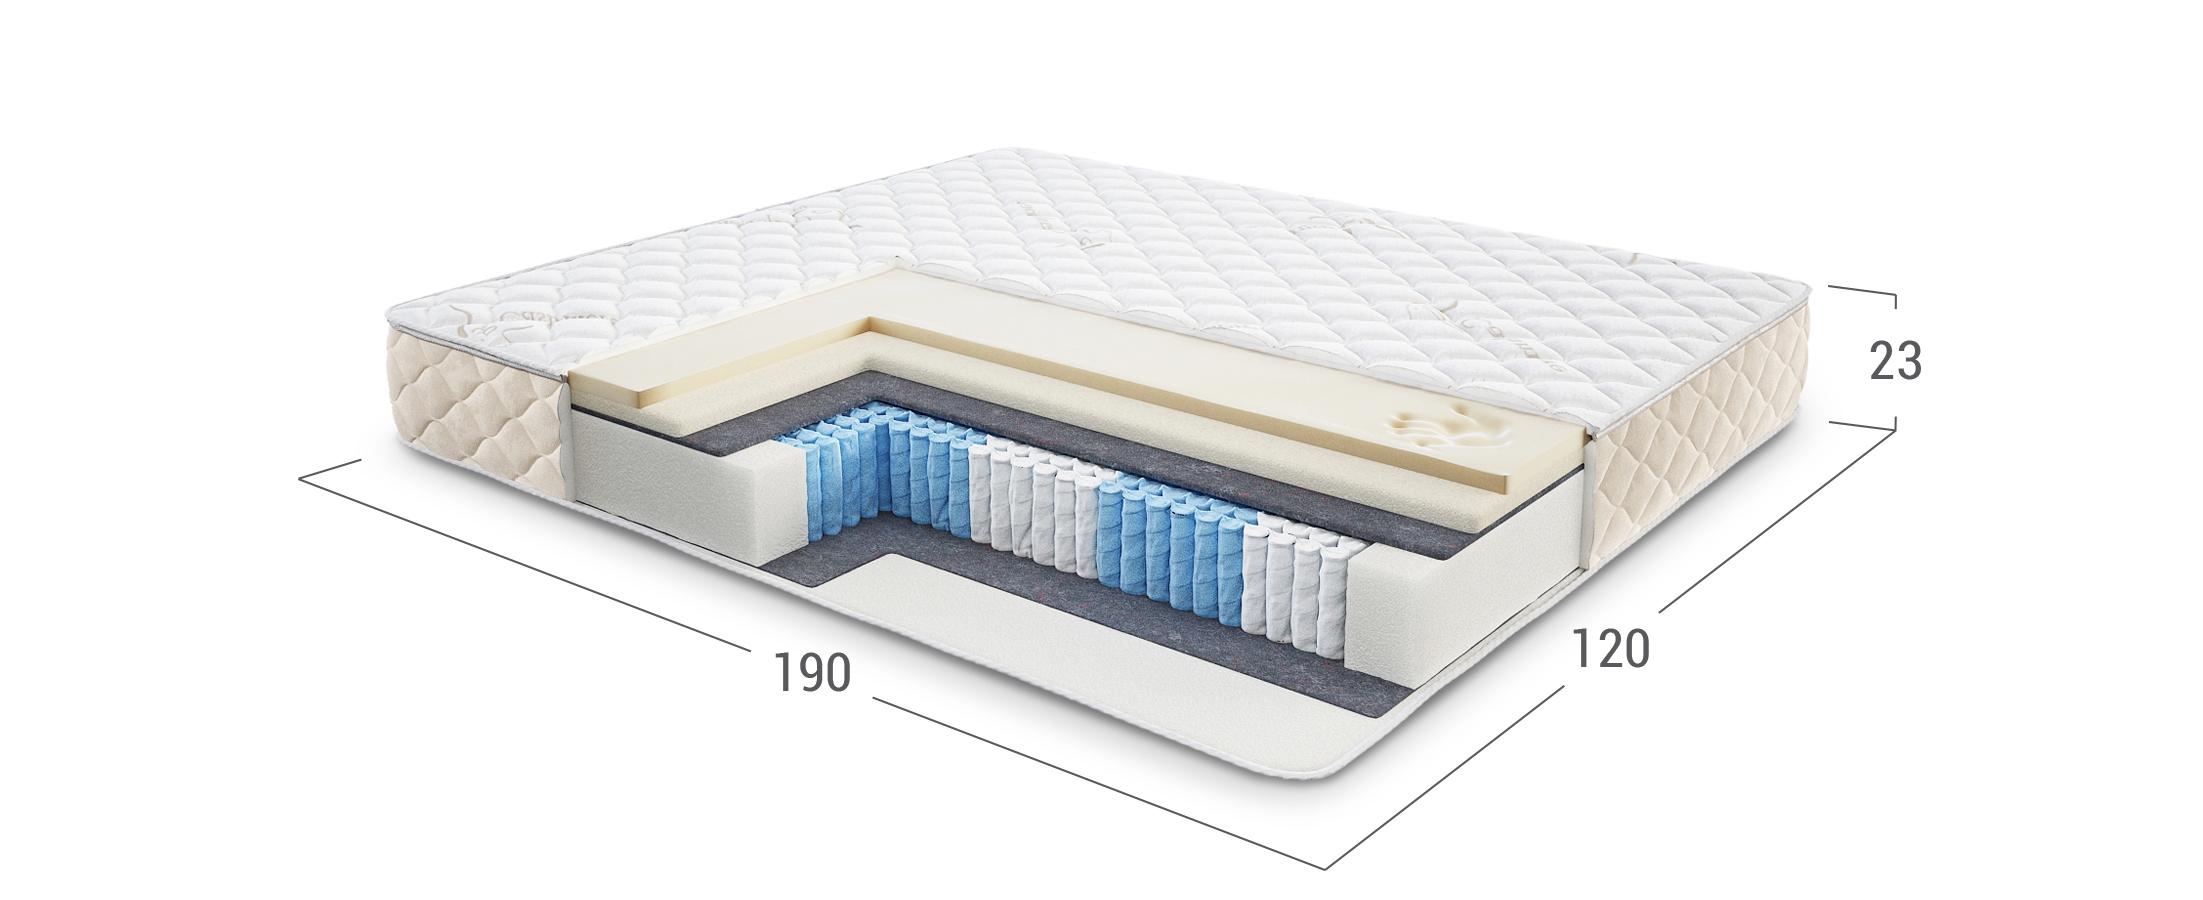 Матрас Comfort Plus Memory Soft 441 матрас 120x190 со съёмным чехлом